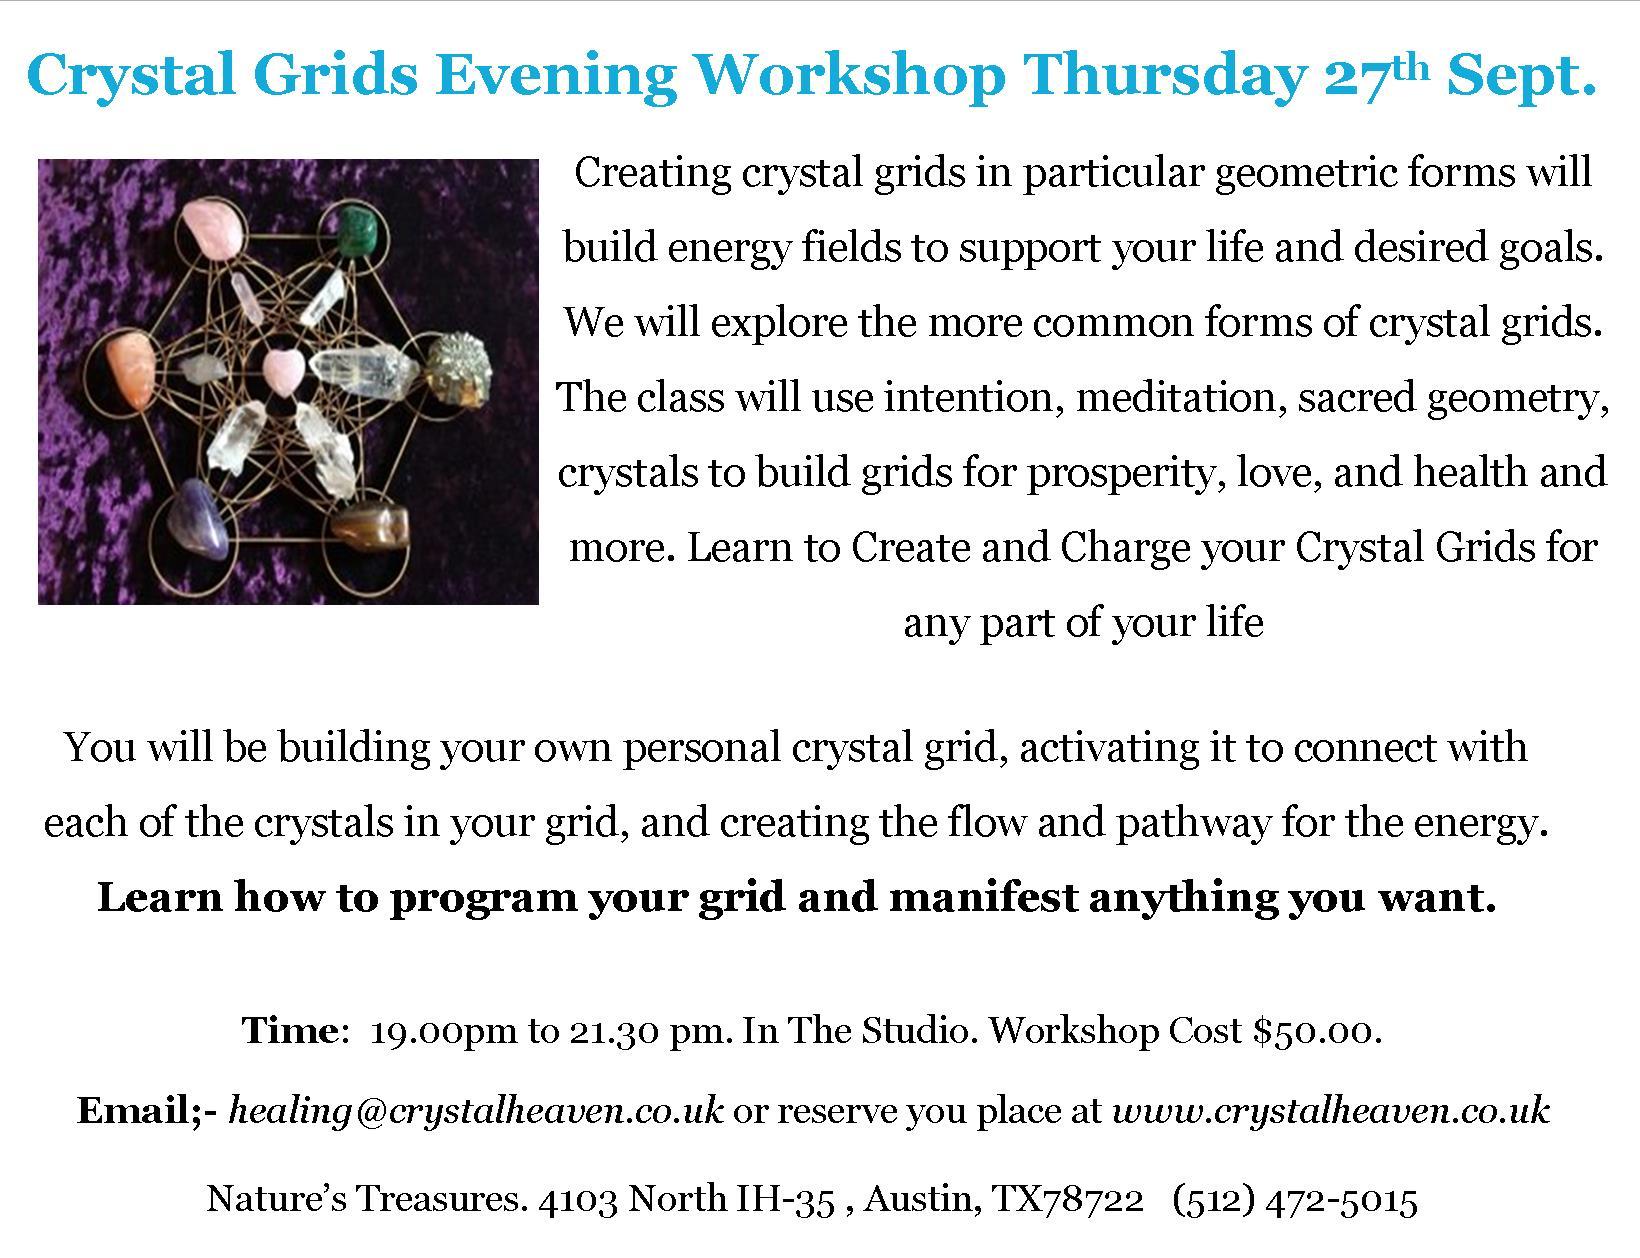 Crystal grids austin -.jpg